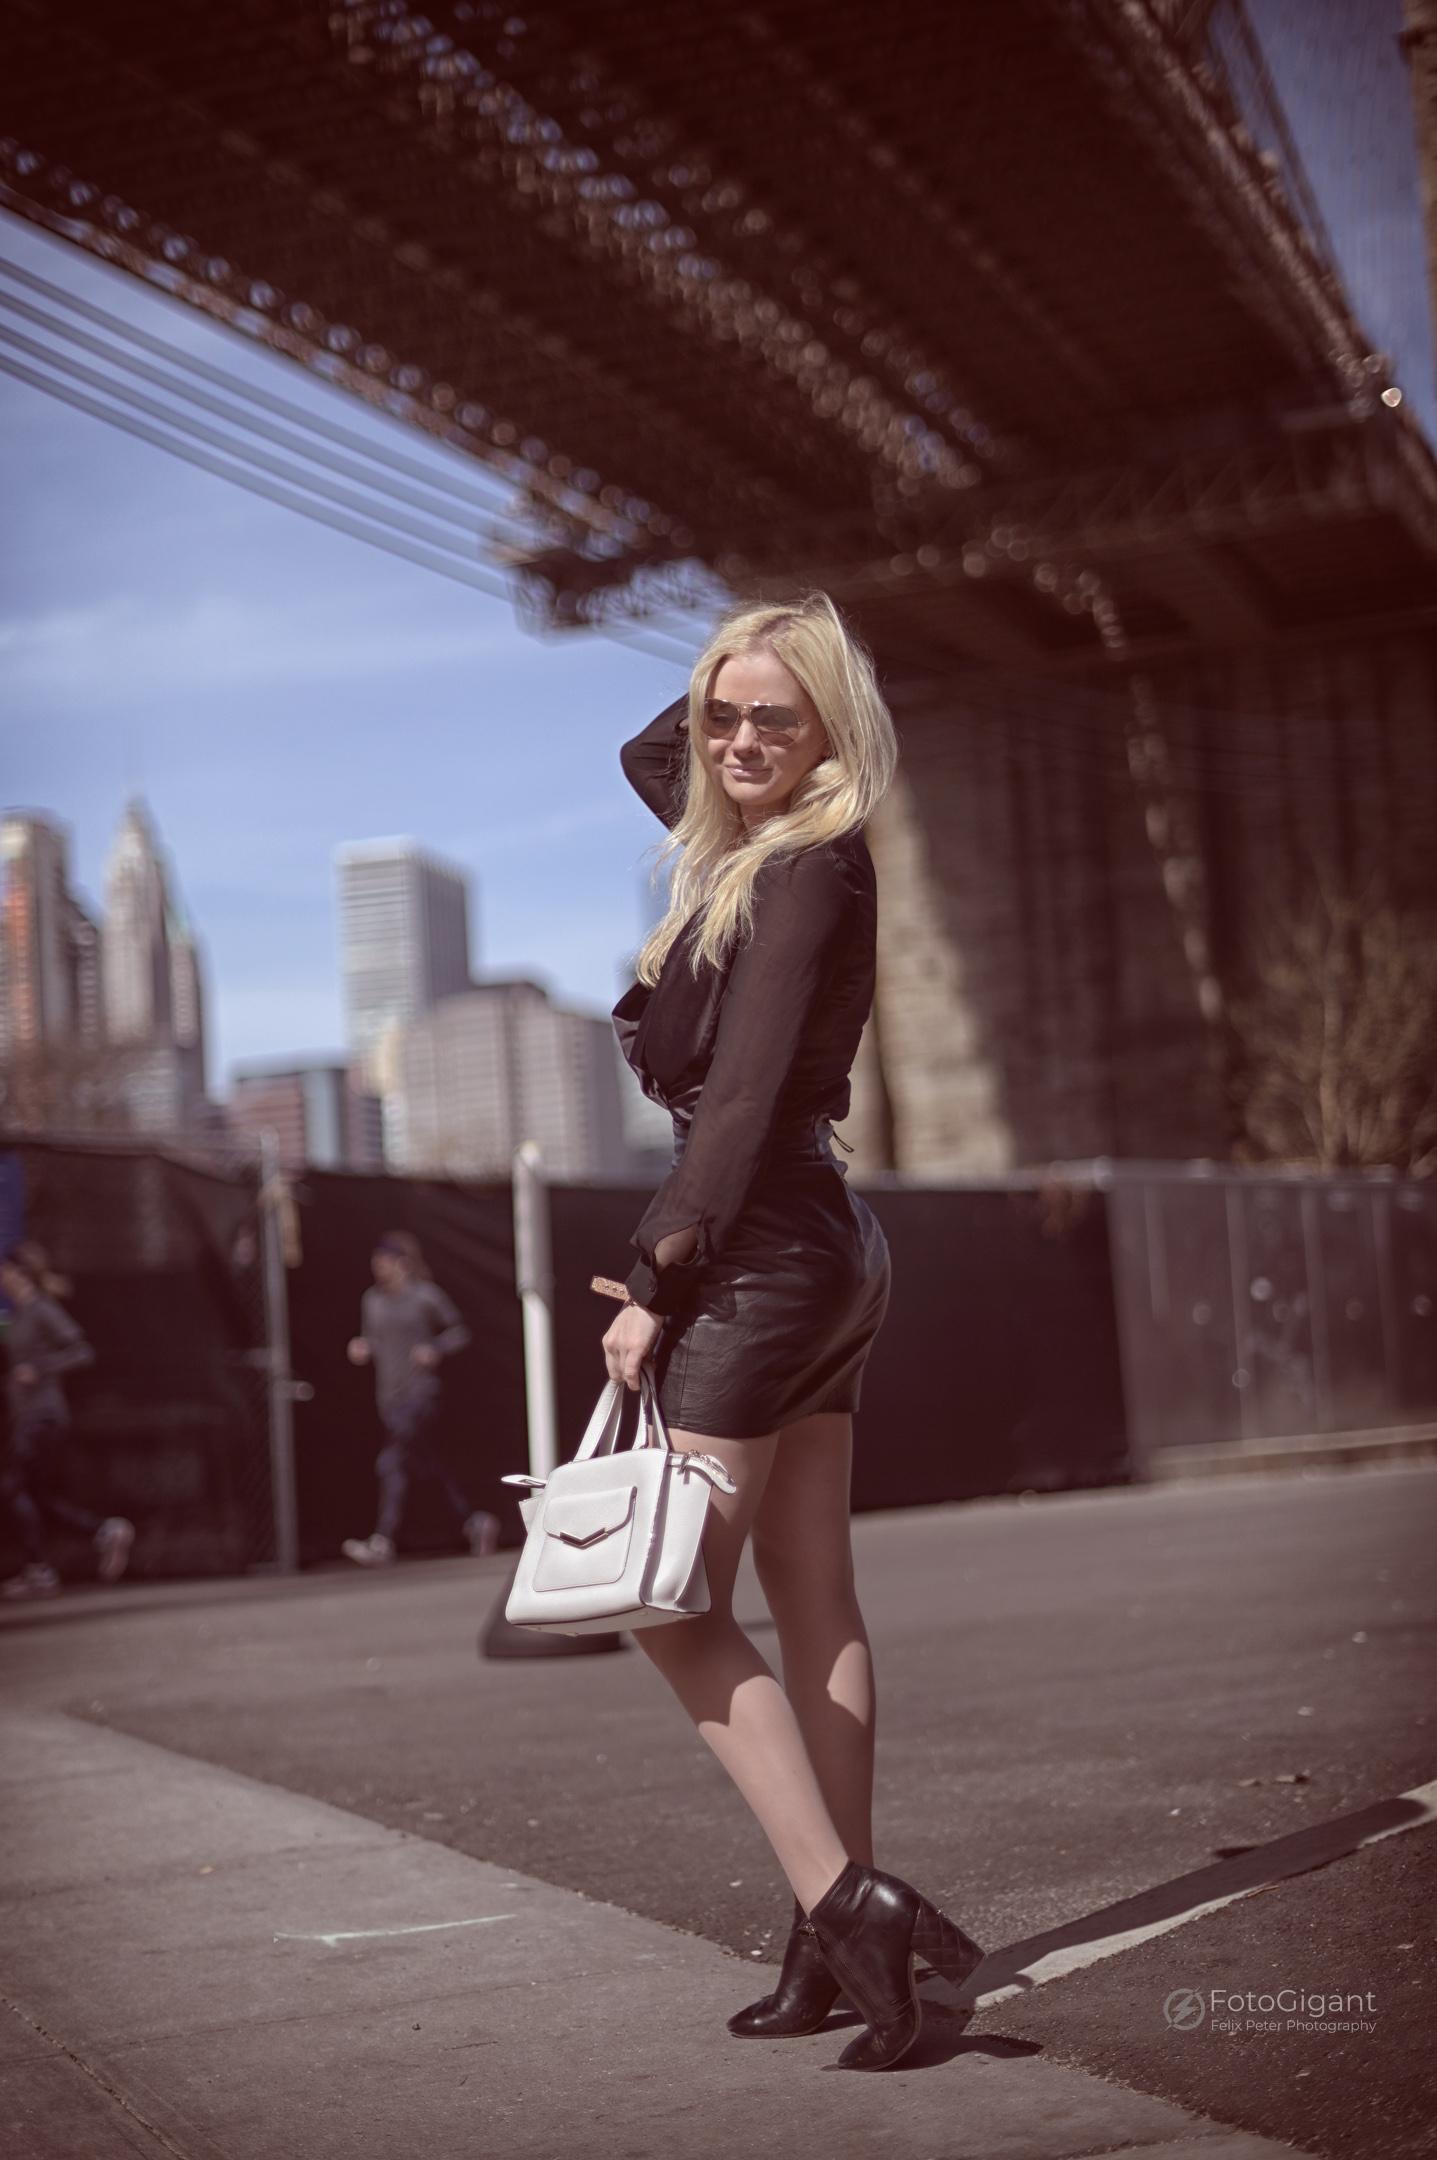 NewYork_JuliaKolomiyets_Fashionphotography_23.jpg